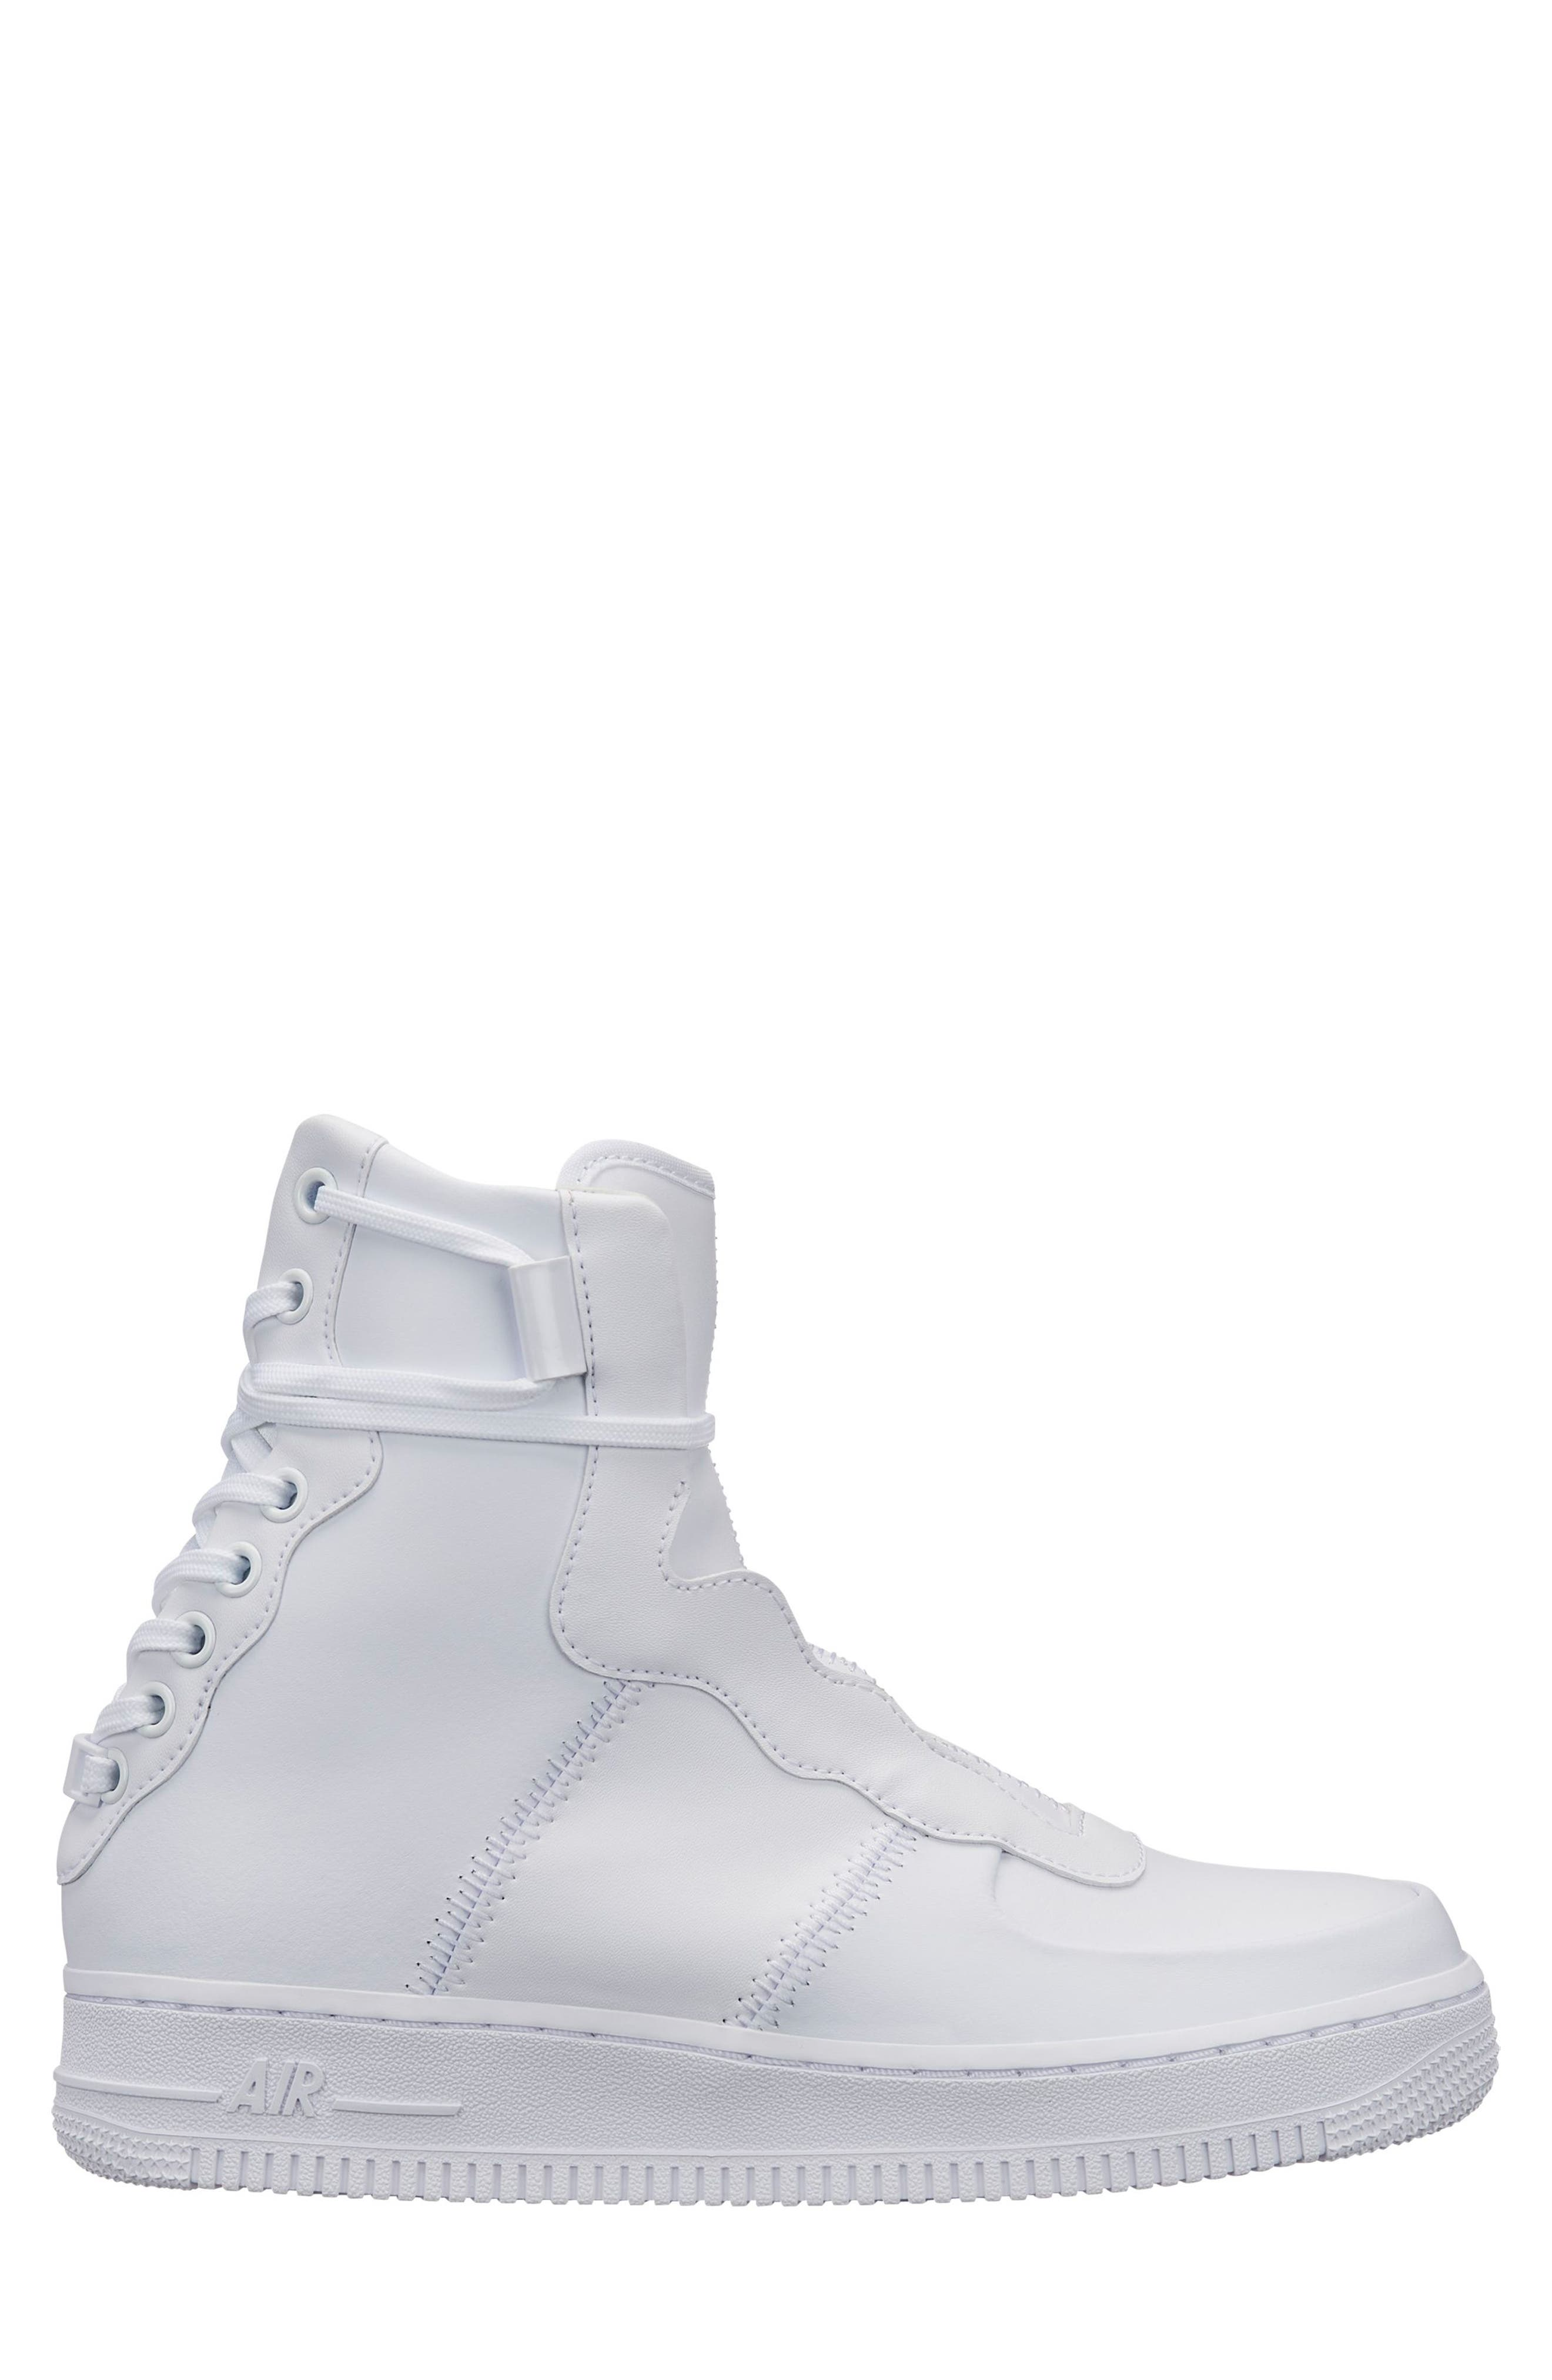 Shop Nike Air Force 1 Rebel Xx High Top